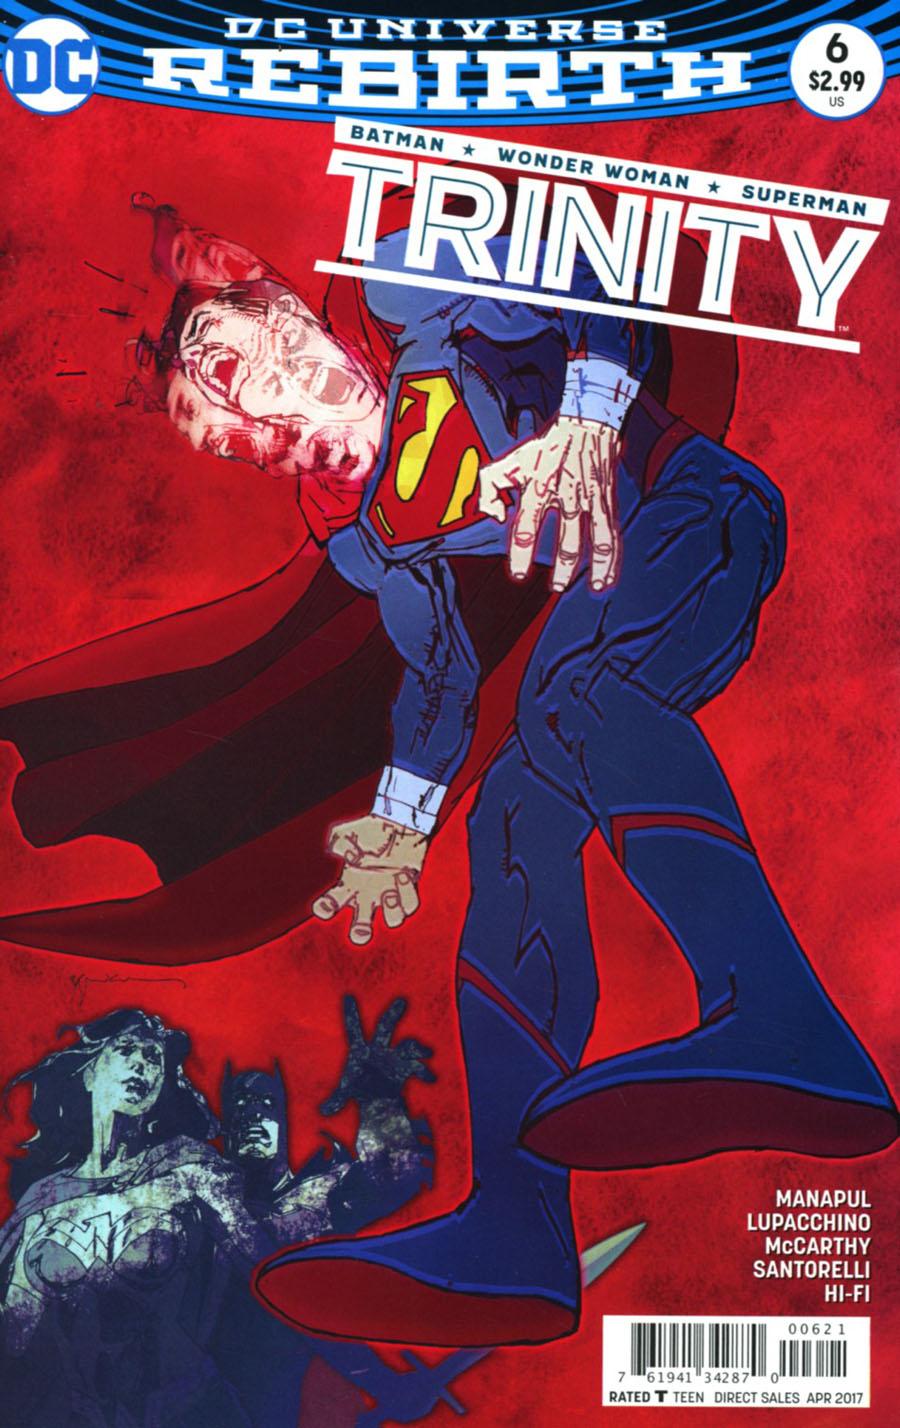 Trinity Vol 2 #6 Cover B Variant Bill Sienkiewicz Cover